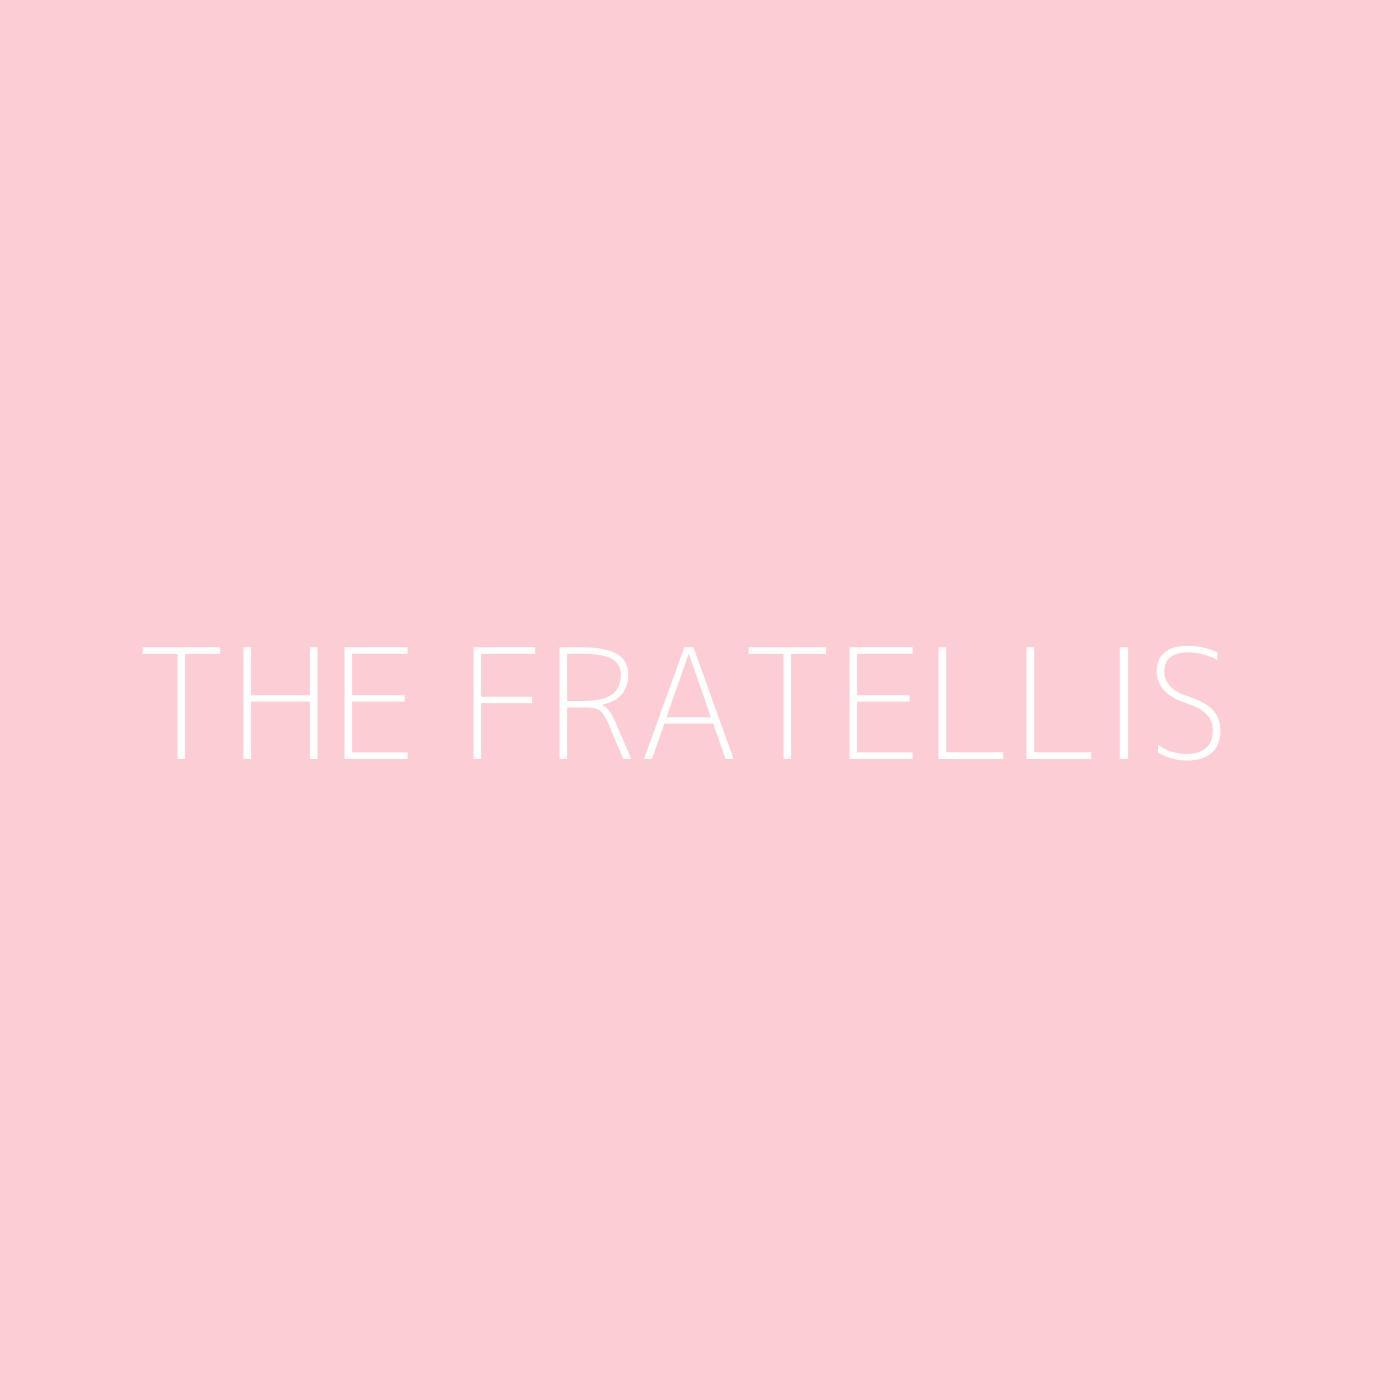 The Fratellis Playlist Artwork